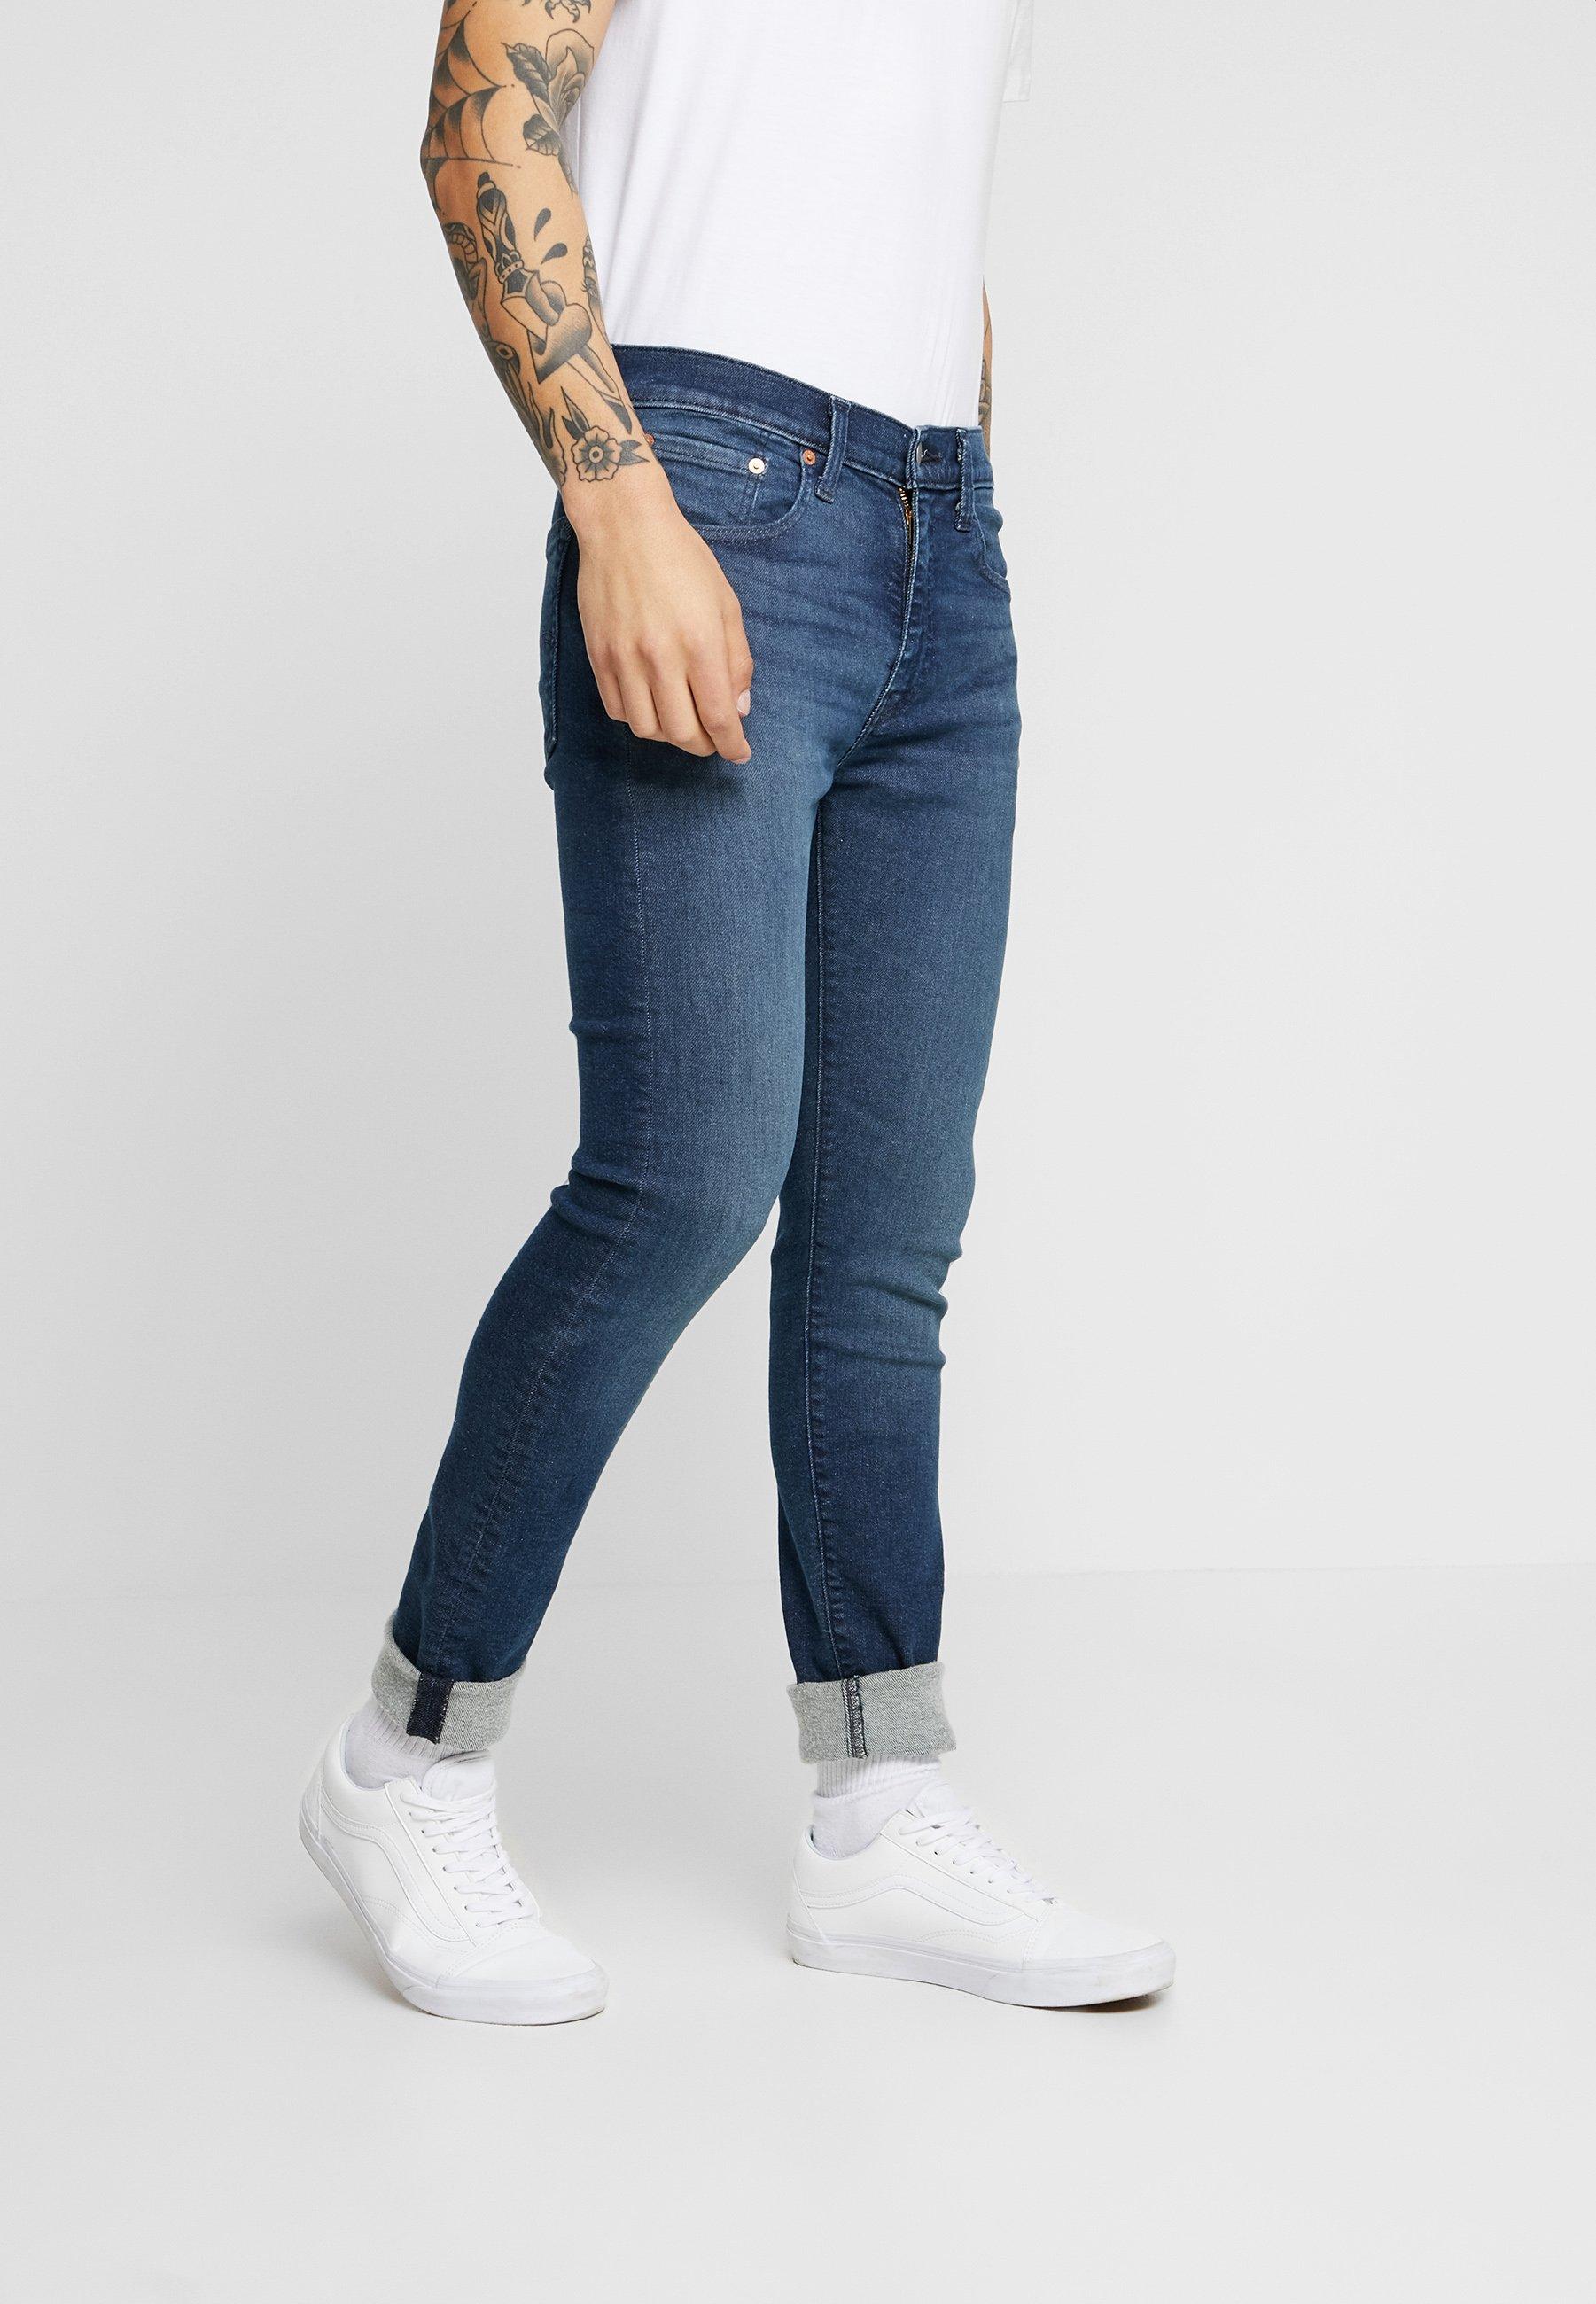 Tnl super Overt FitJeans Adv Skinny Sage 519� Levi's® ON8mnwv0